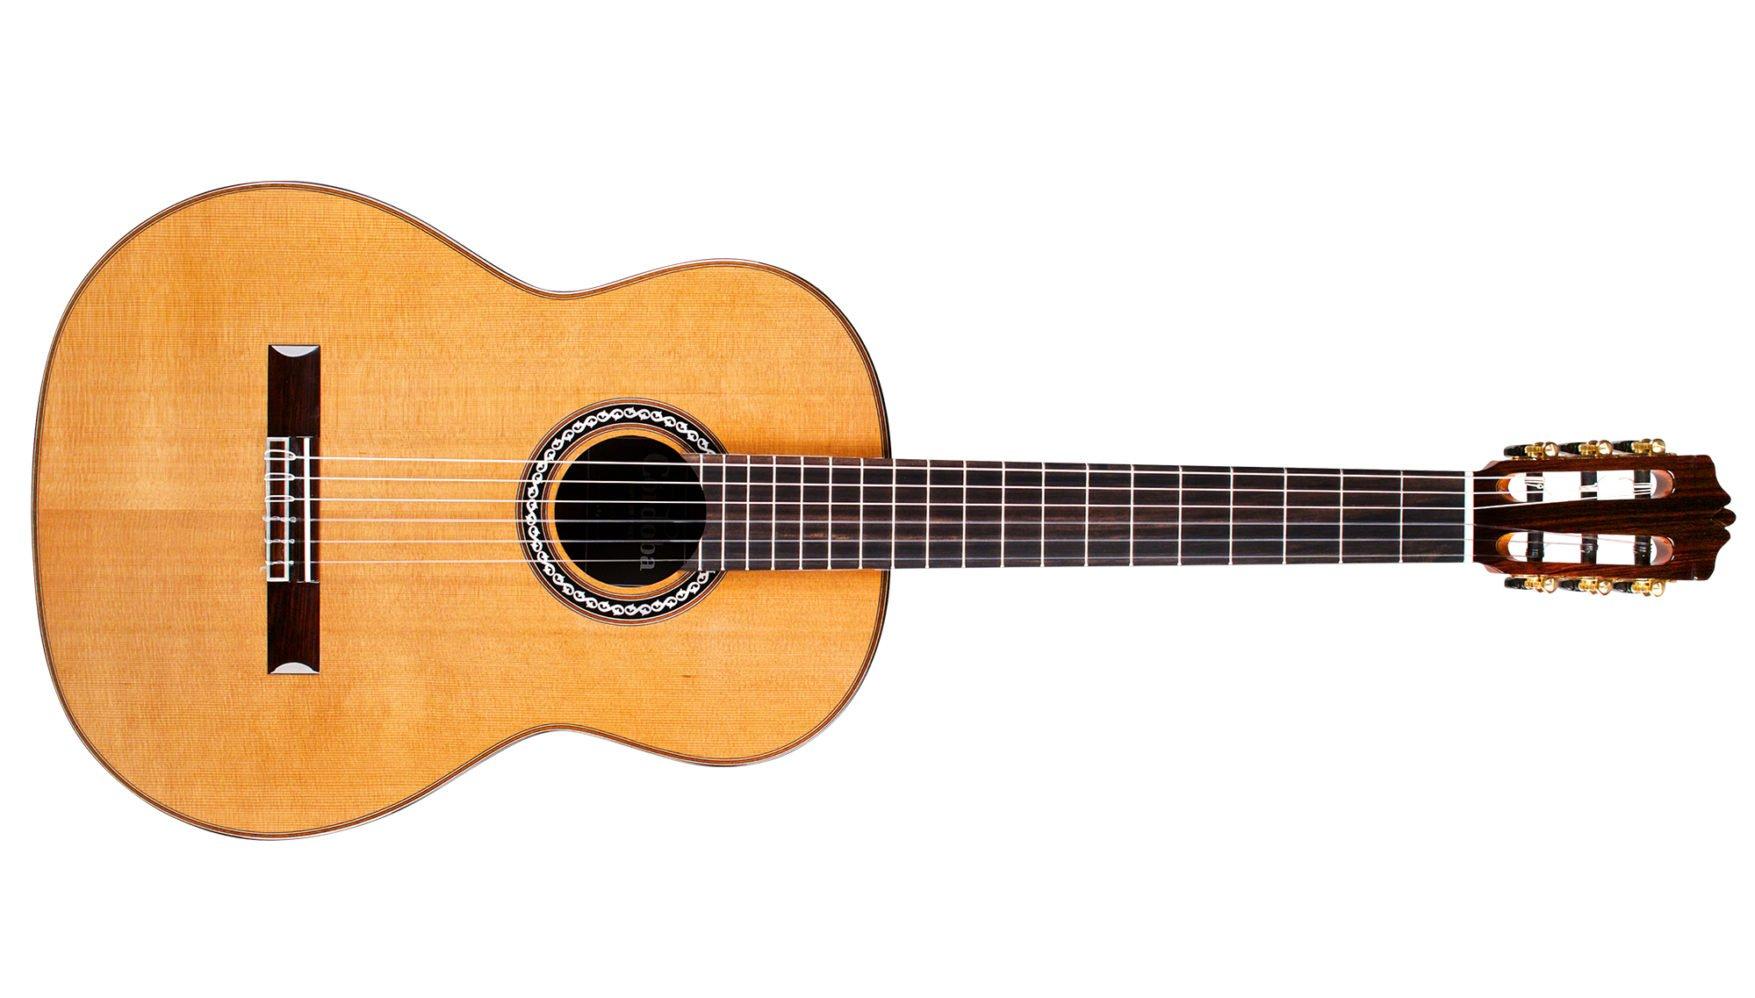 Cordoba C10 Cedar Top Luthier Series